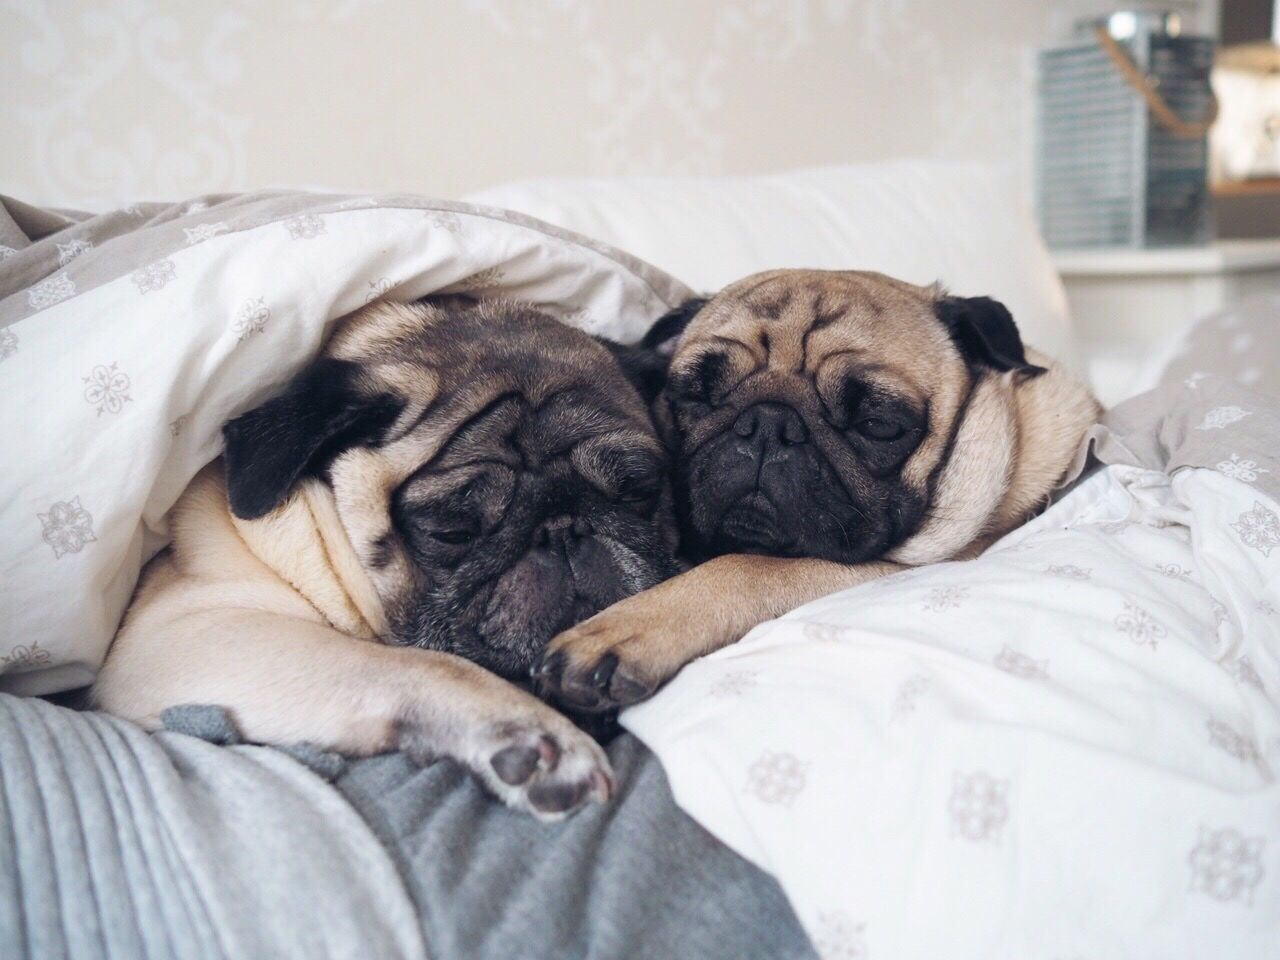 Two pugs sleeping together